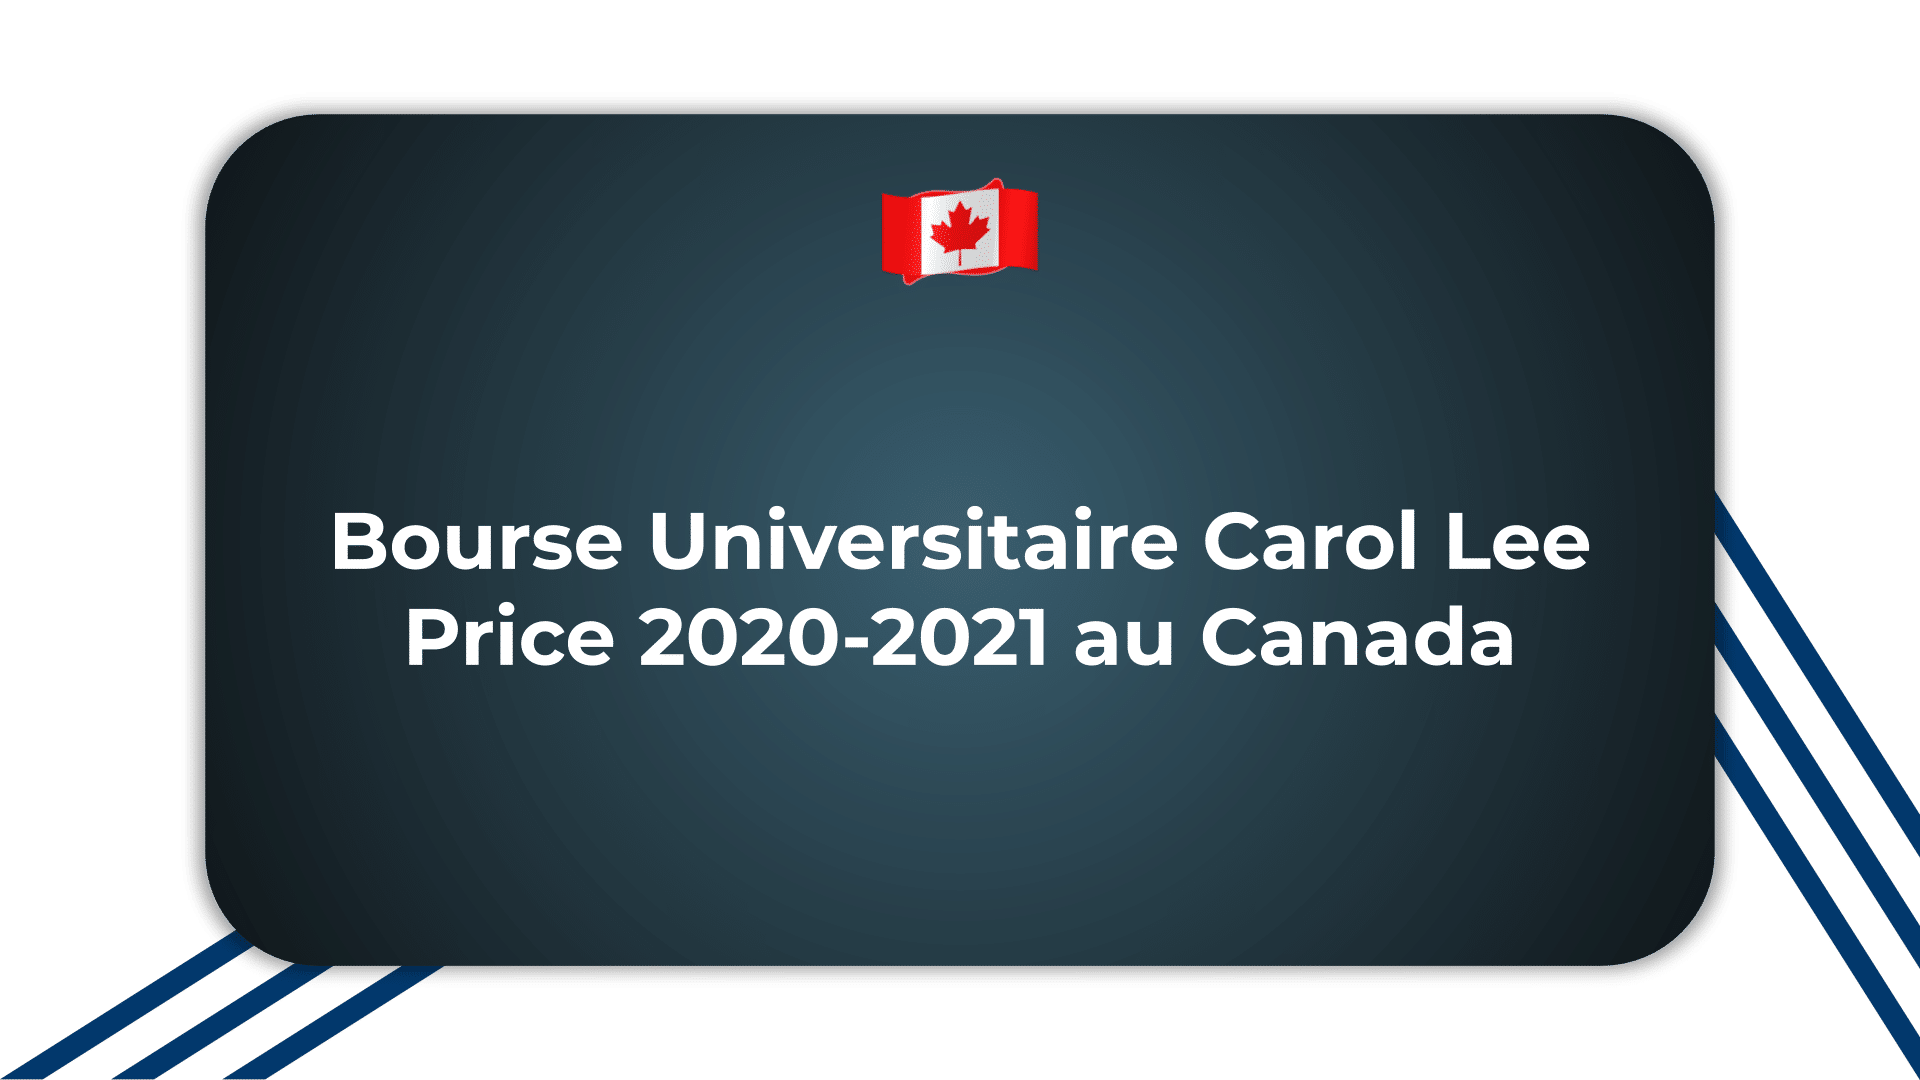 Bourse Universitaire Carol Lee Price